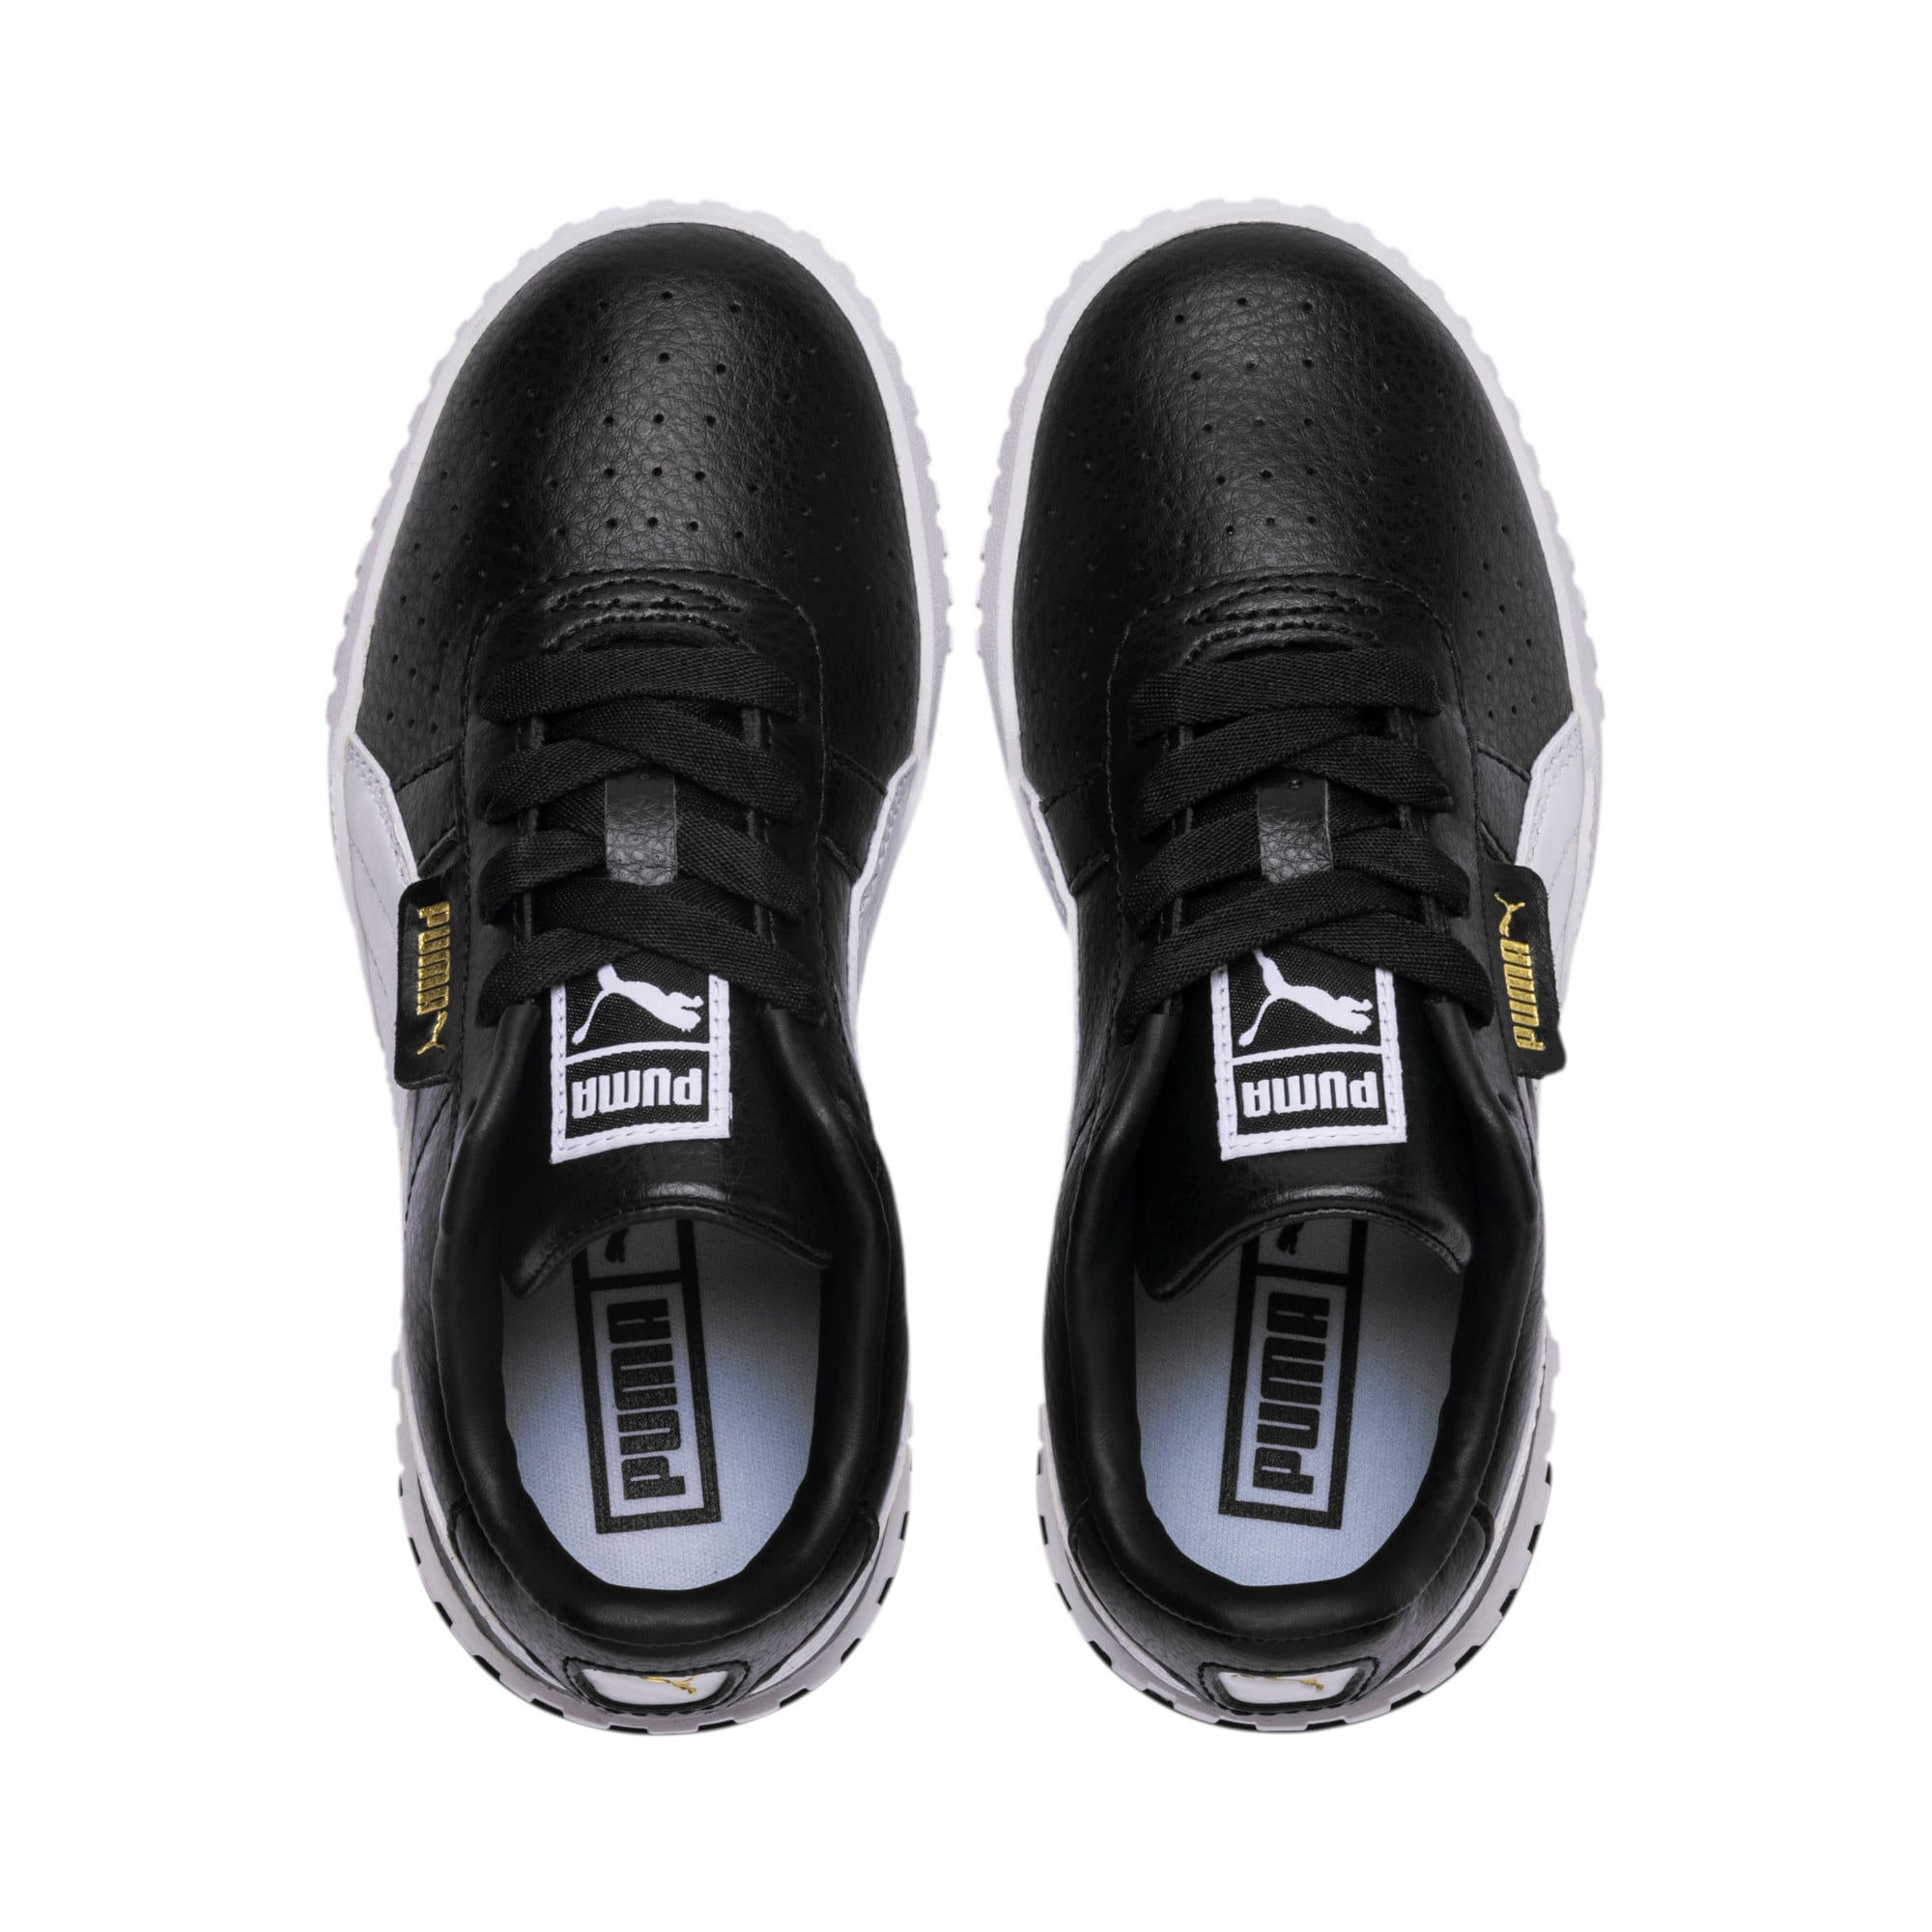 Imagen en miniatura 6 de Zapatillas Cali de niña, Puma Black-Puma Team Gold, mediana